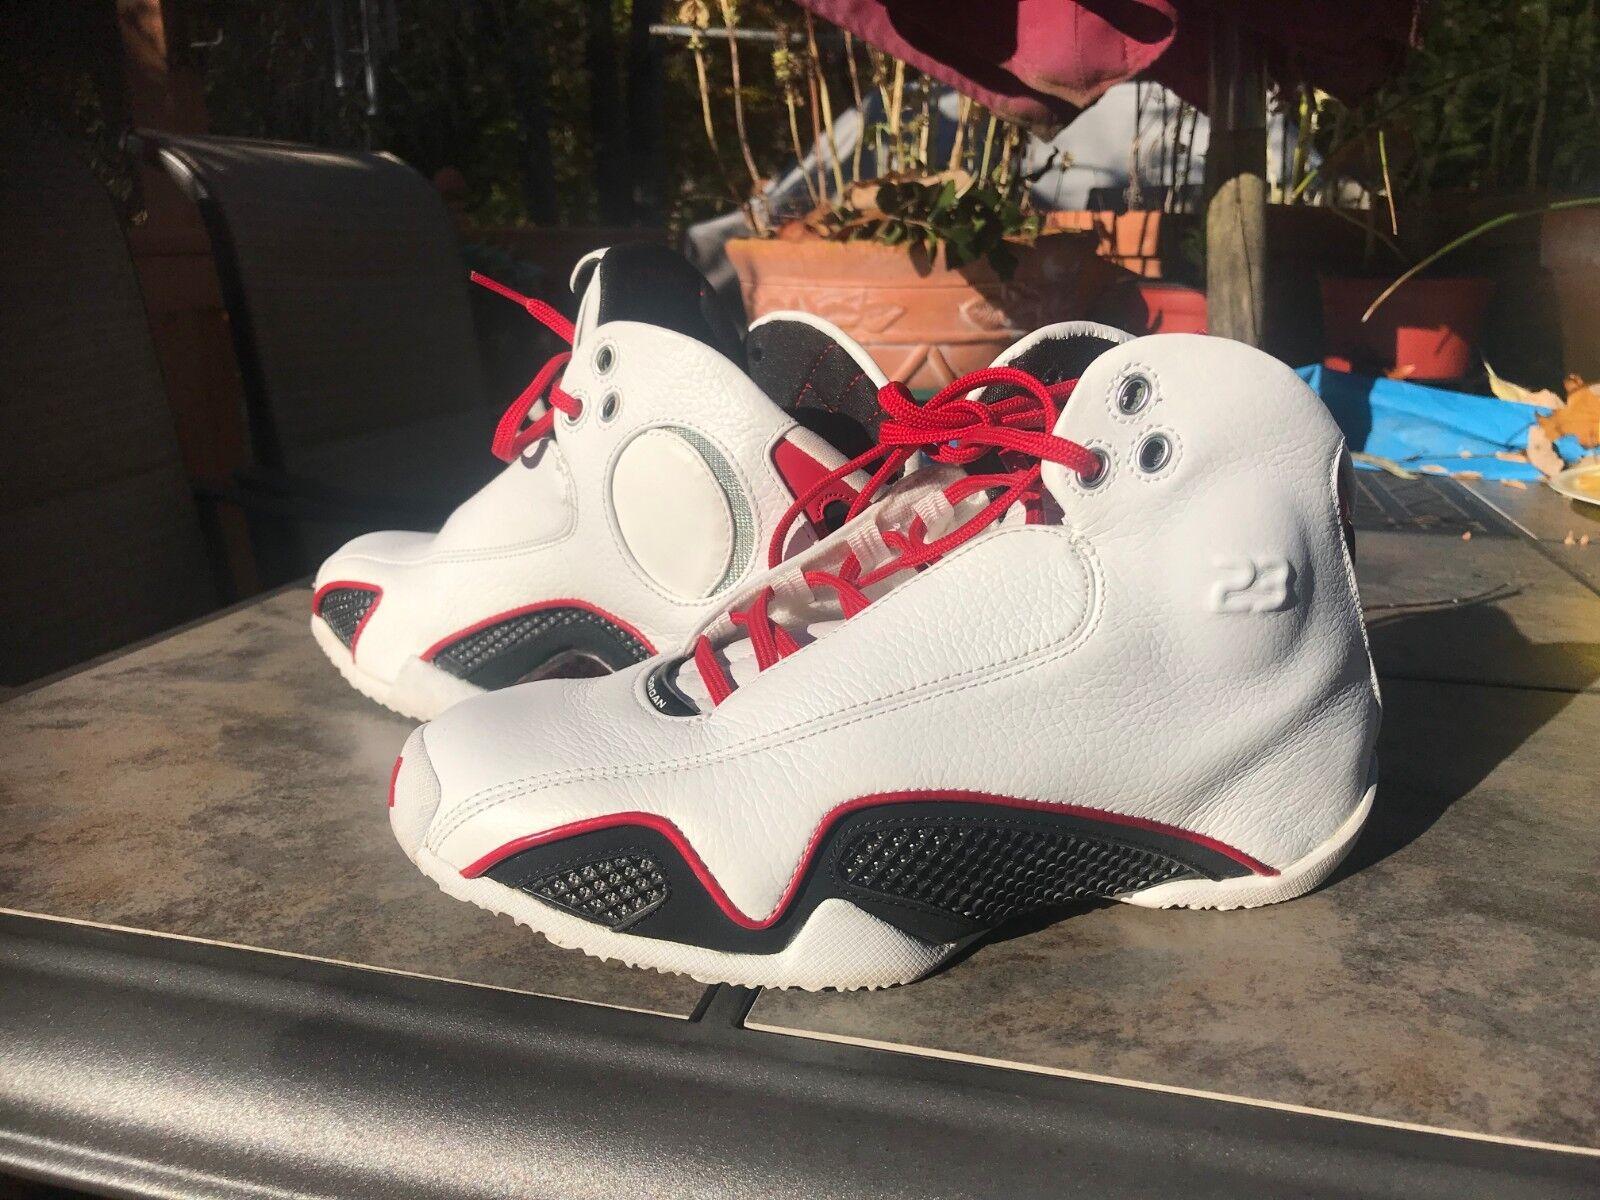 d1aa3ffd48976 Air Jordan Sneaker Authentic Retro White Black-Varsity Red size 5Y US. Nike  MEN'S Air Vapormax Flyknit 2 ...